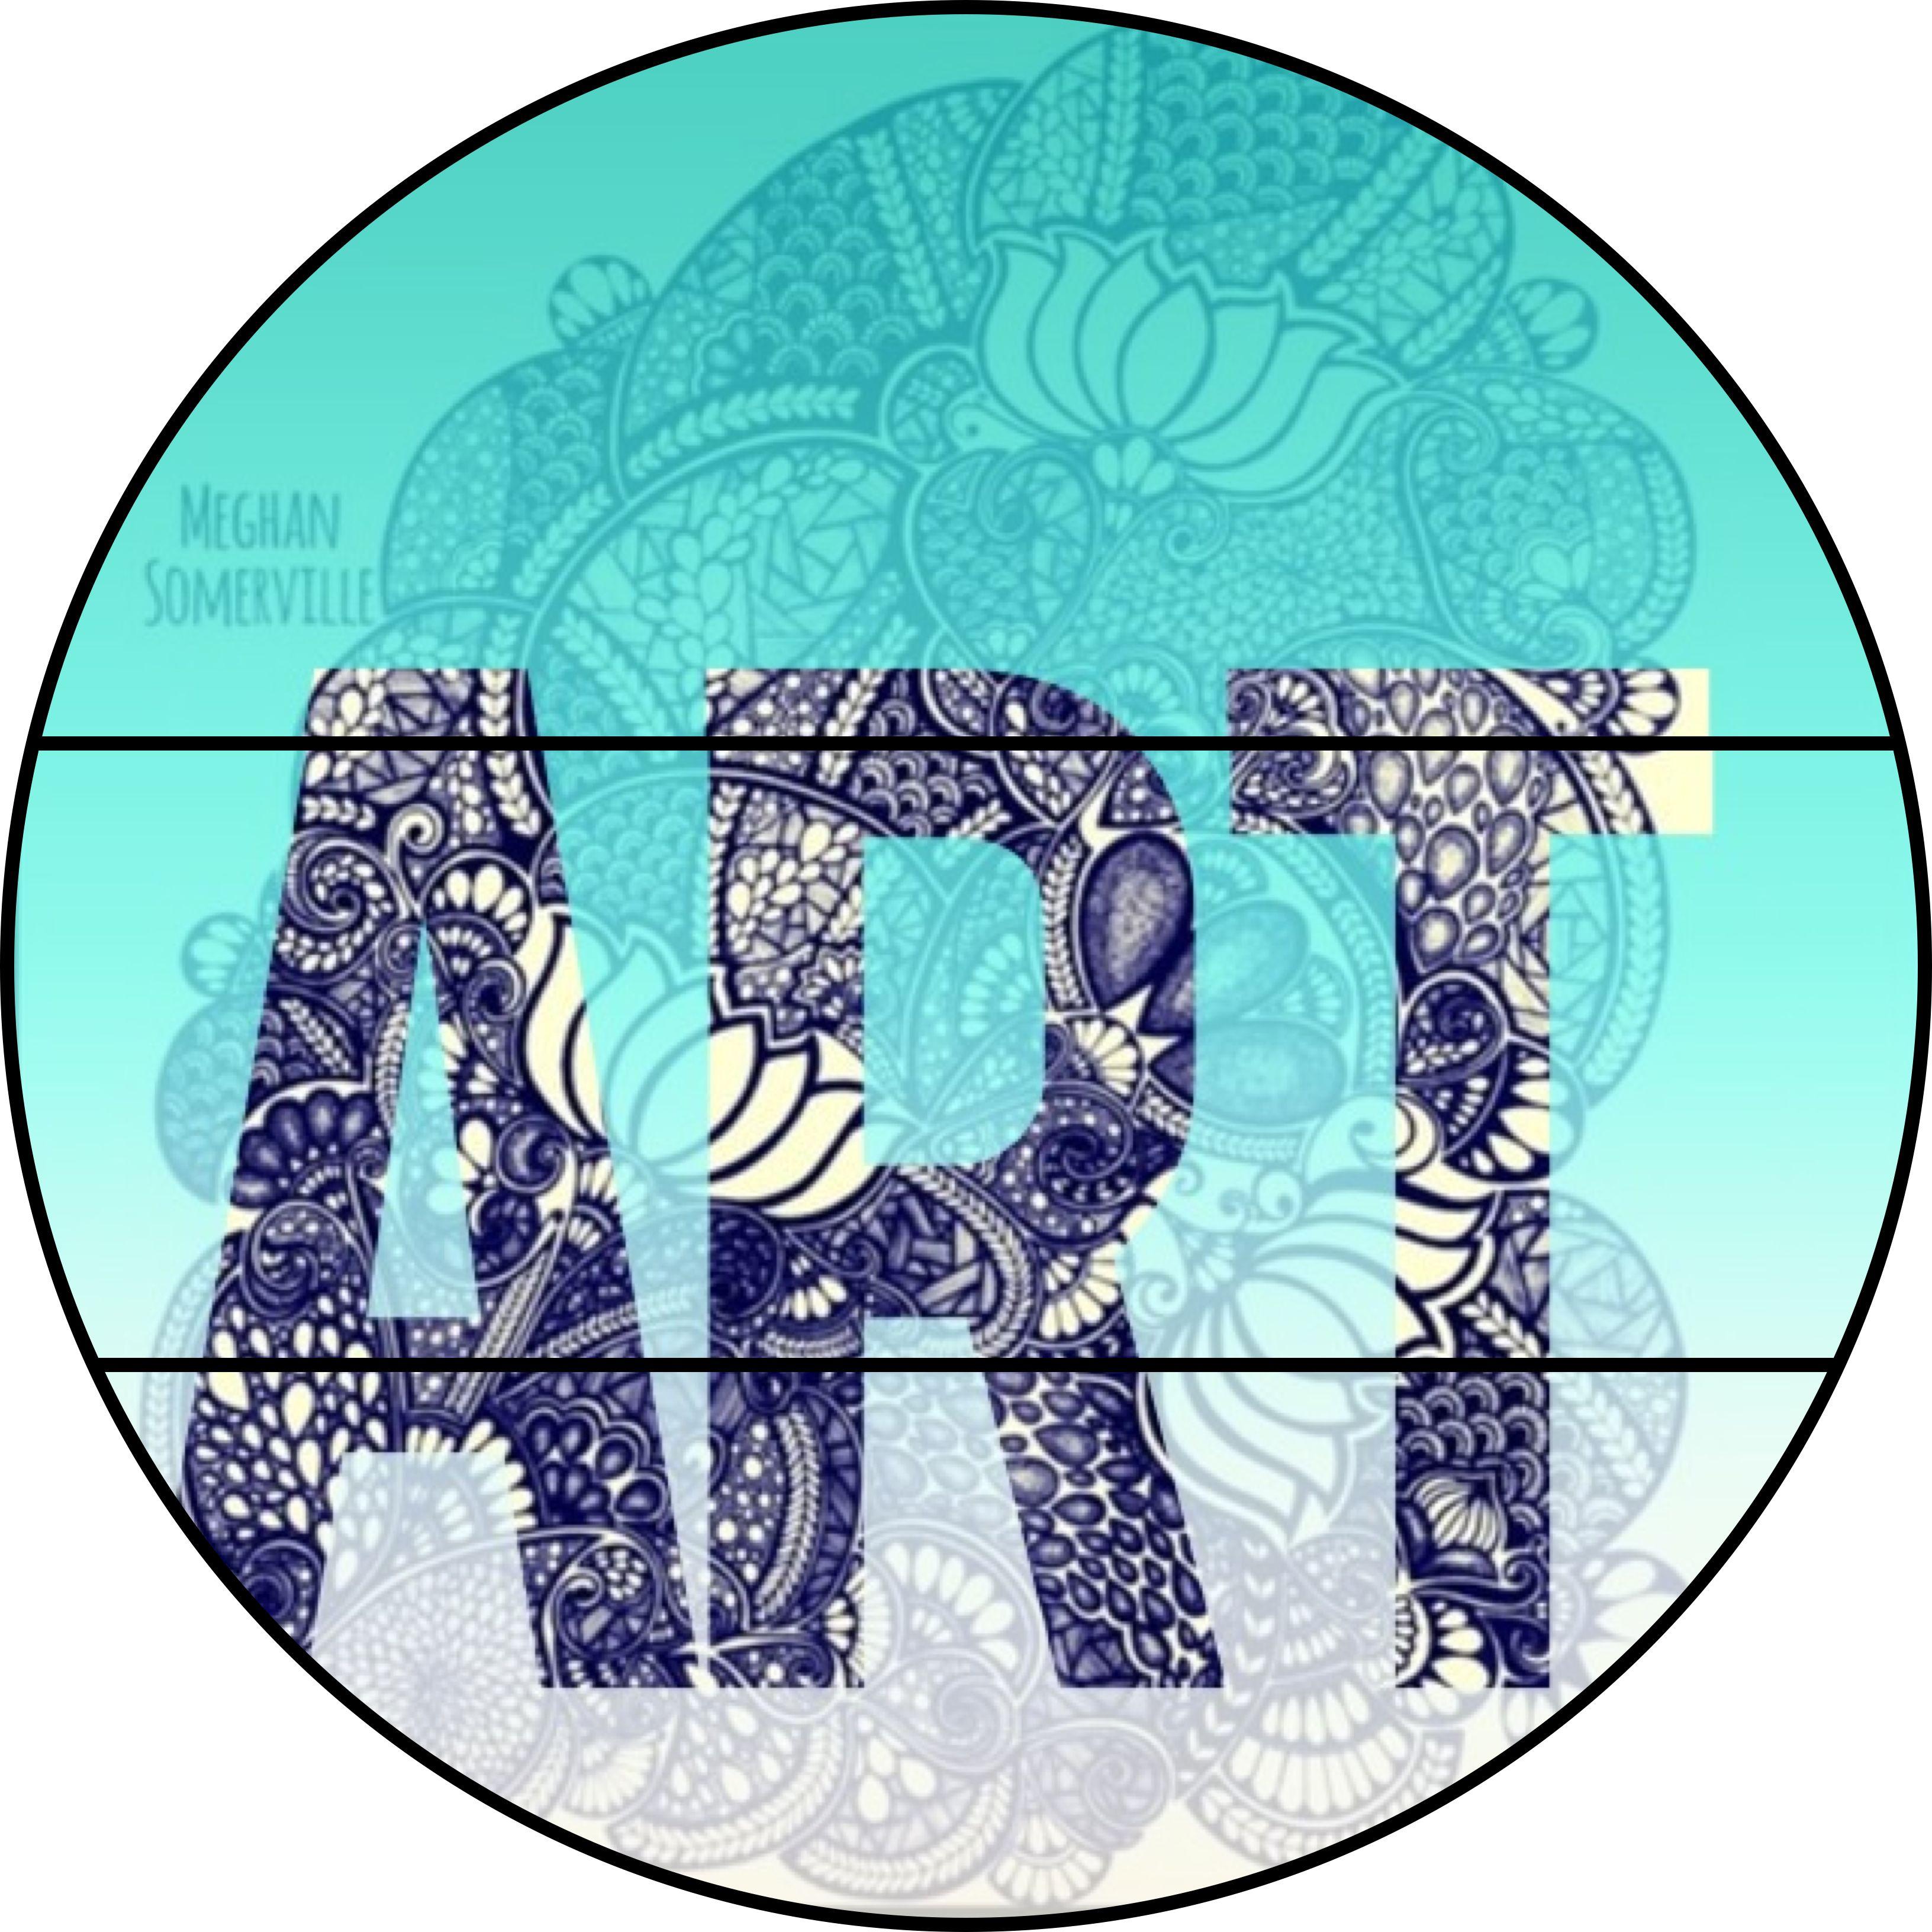 Support your local artists. Do art. Love art.